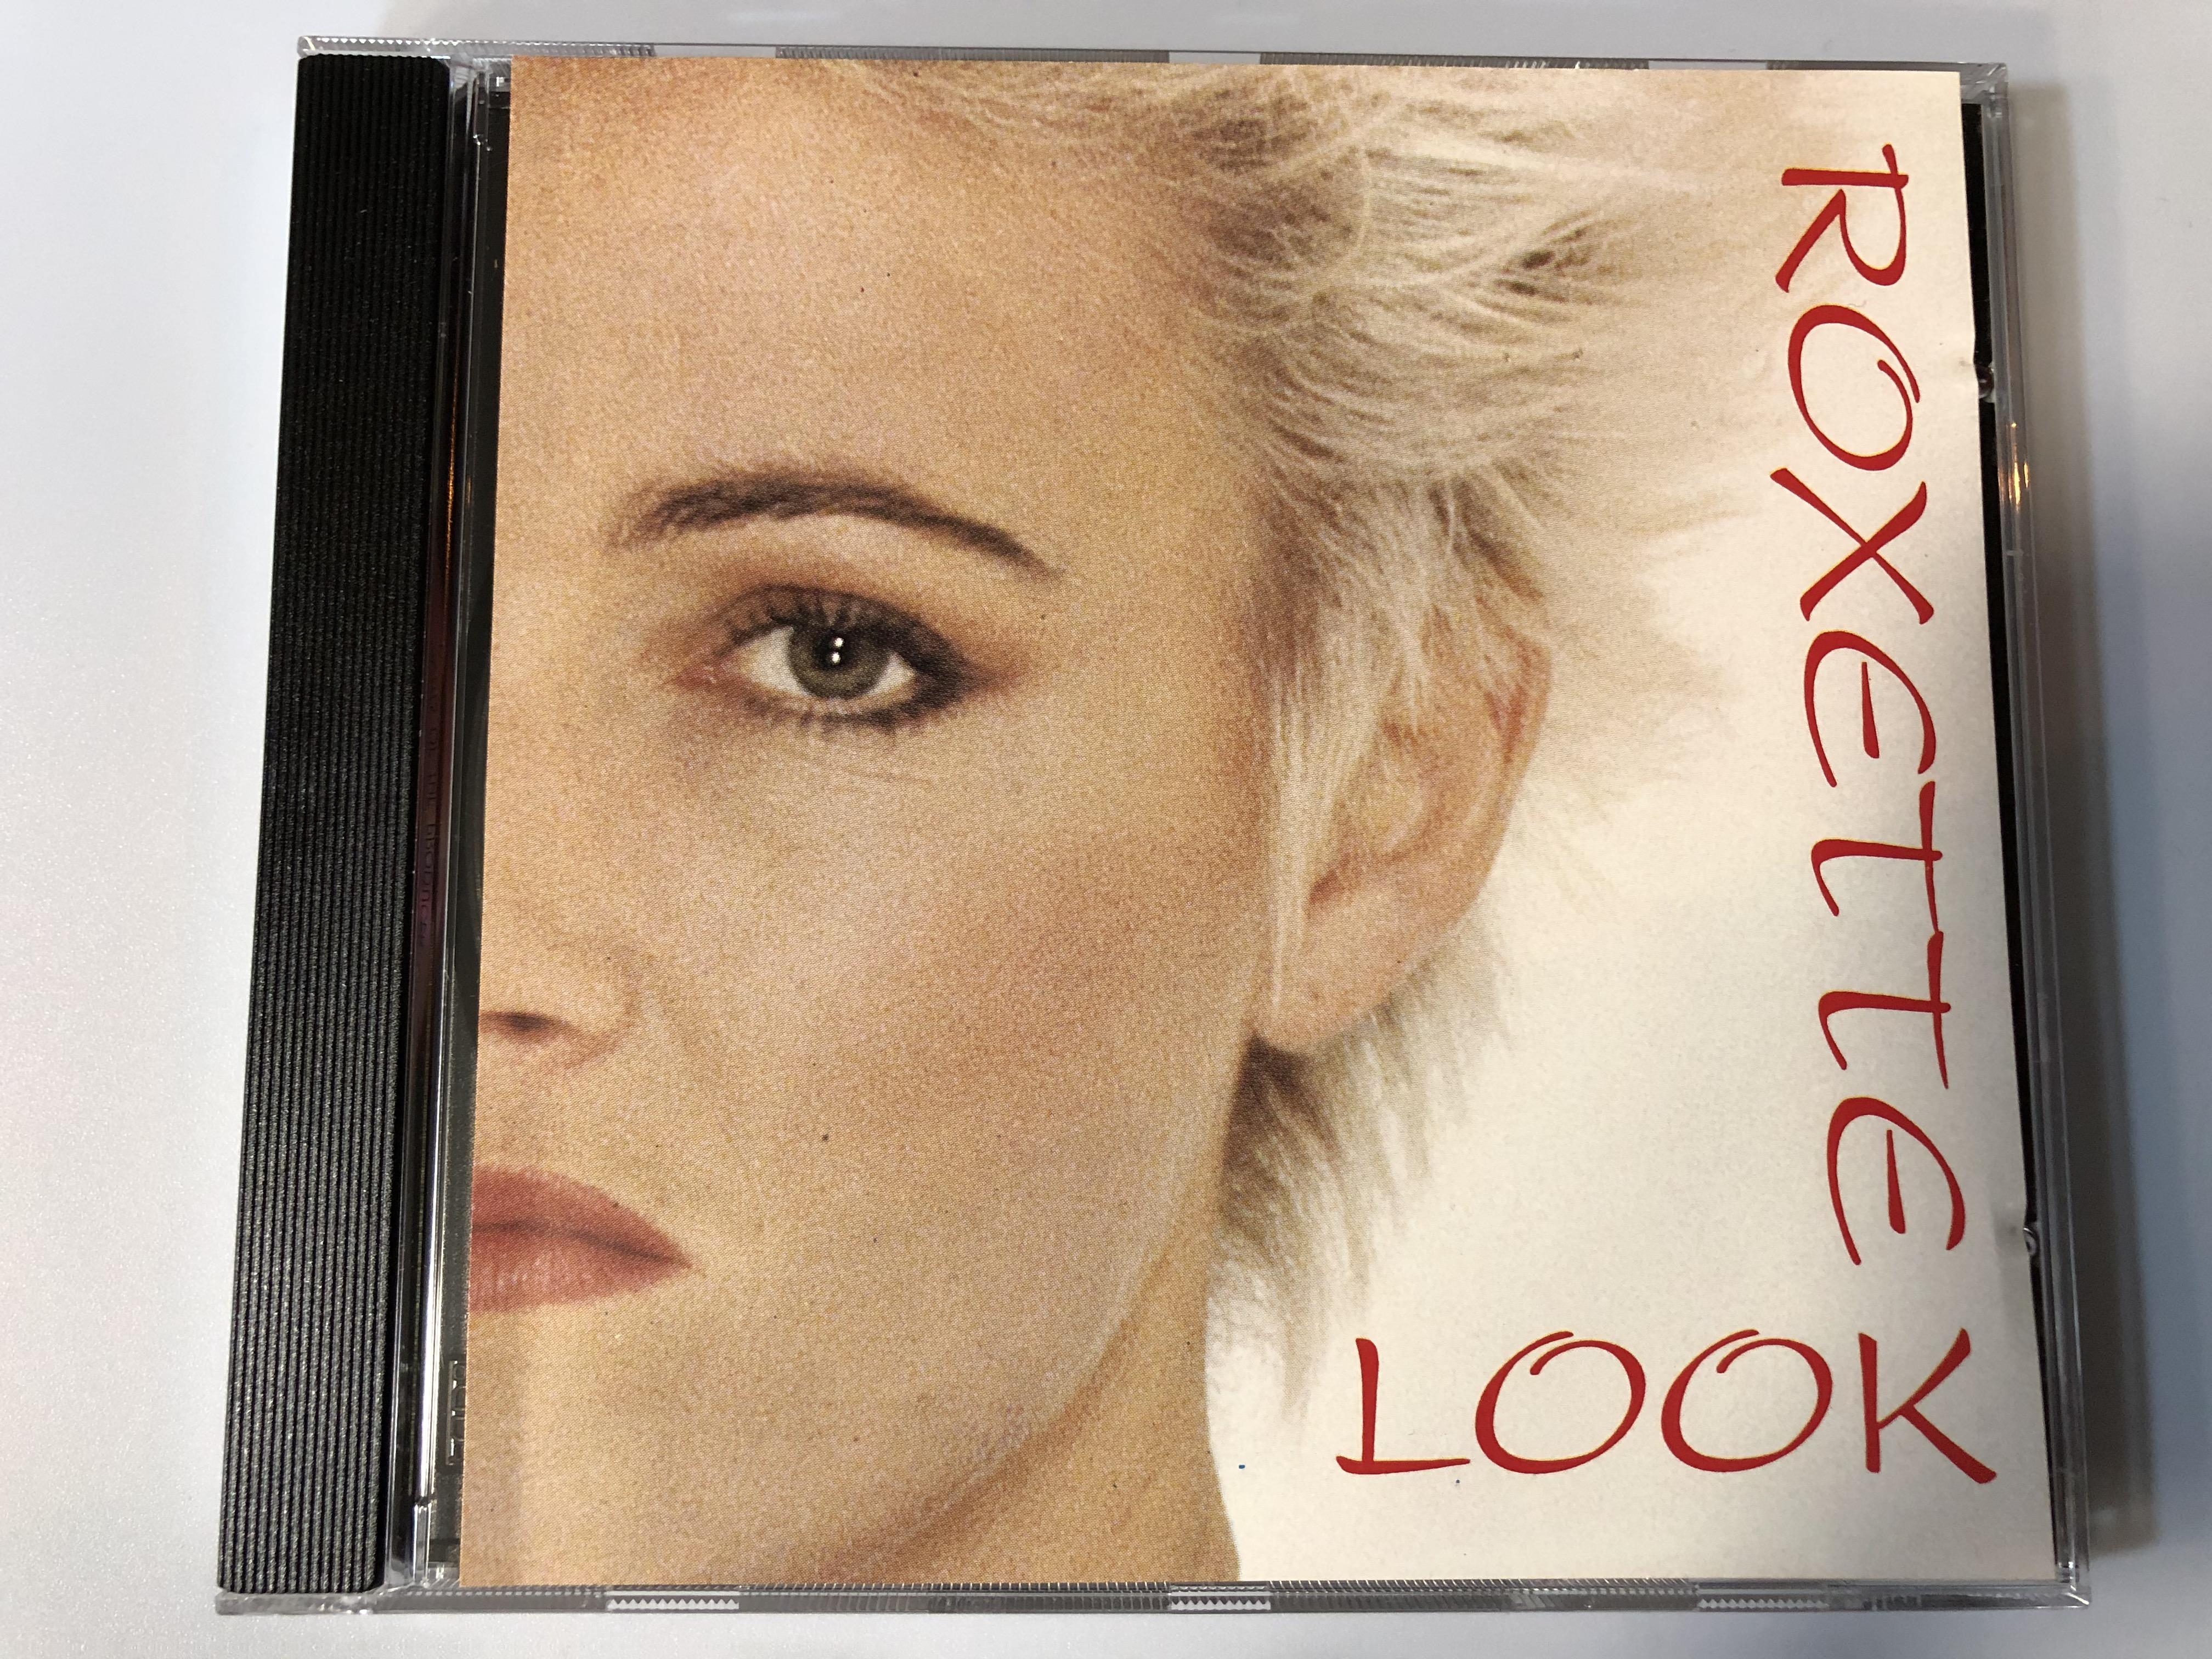 roxette-the-look-stentor-audio-cd-1992-sten-91-1-.jpg